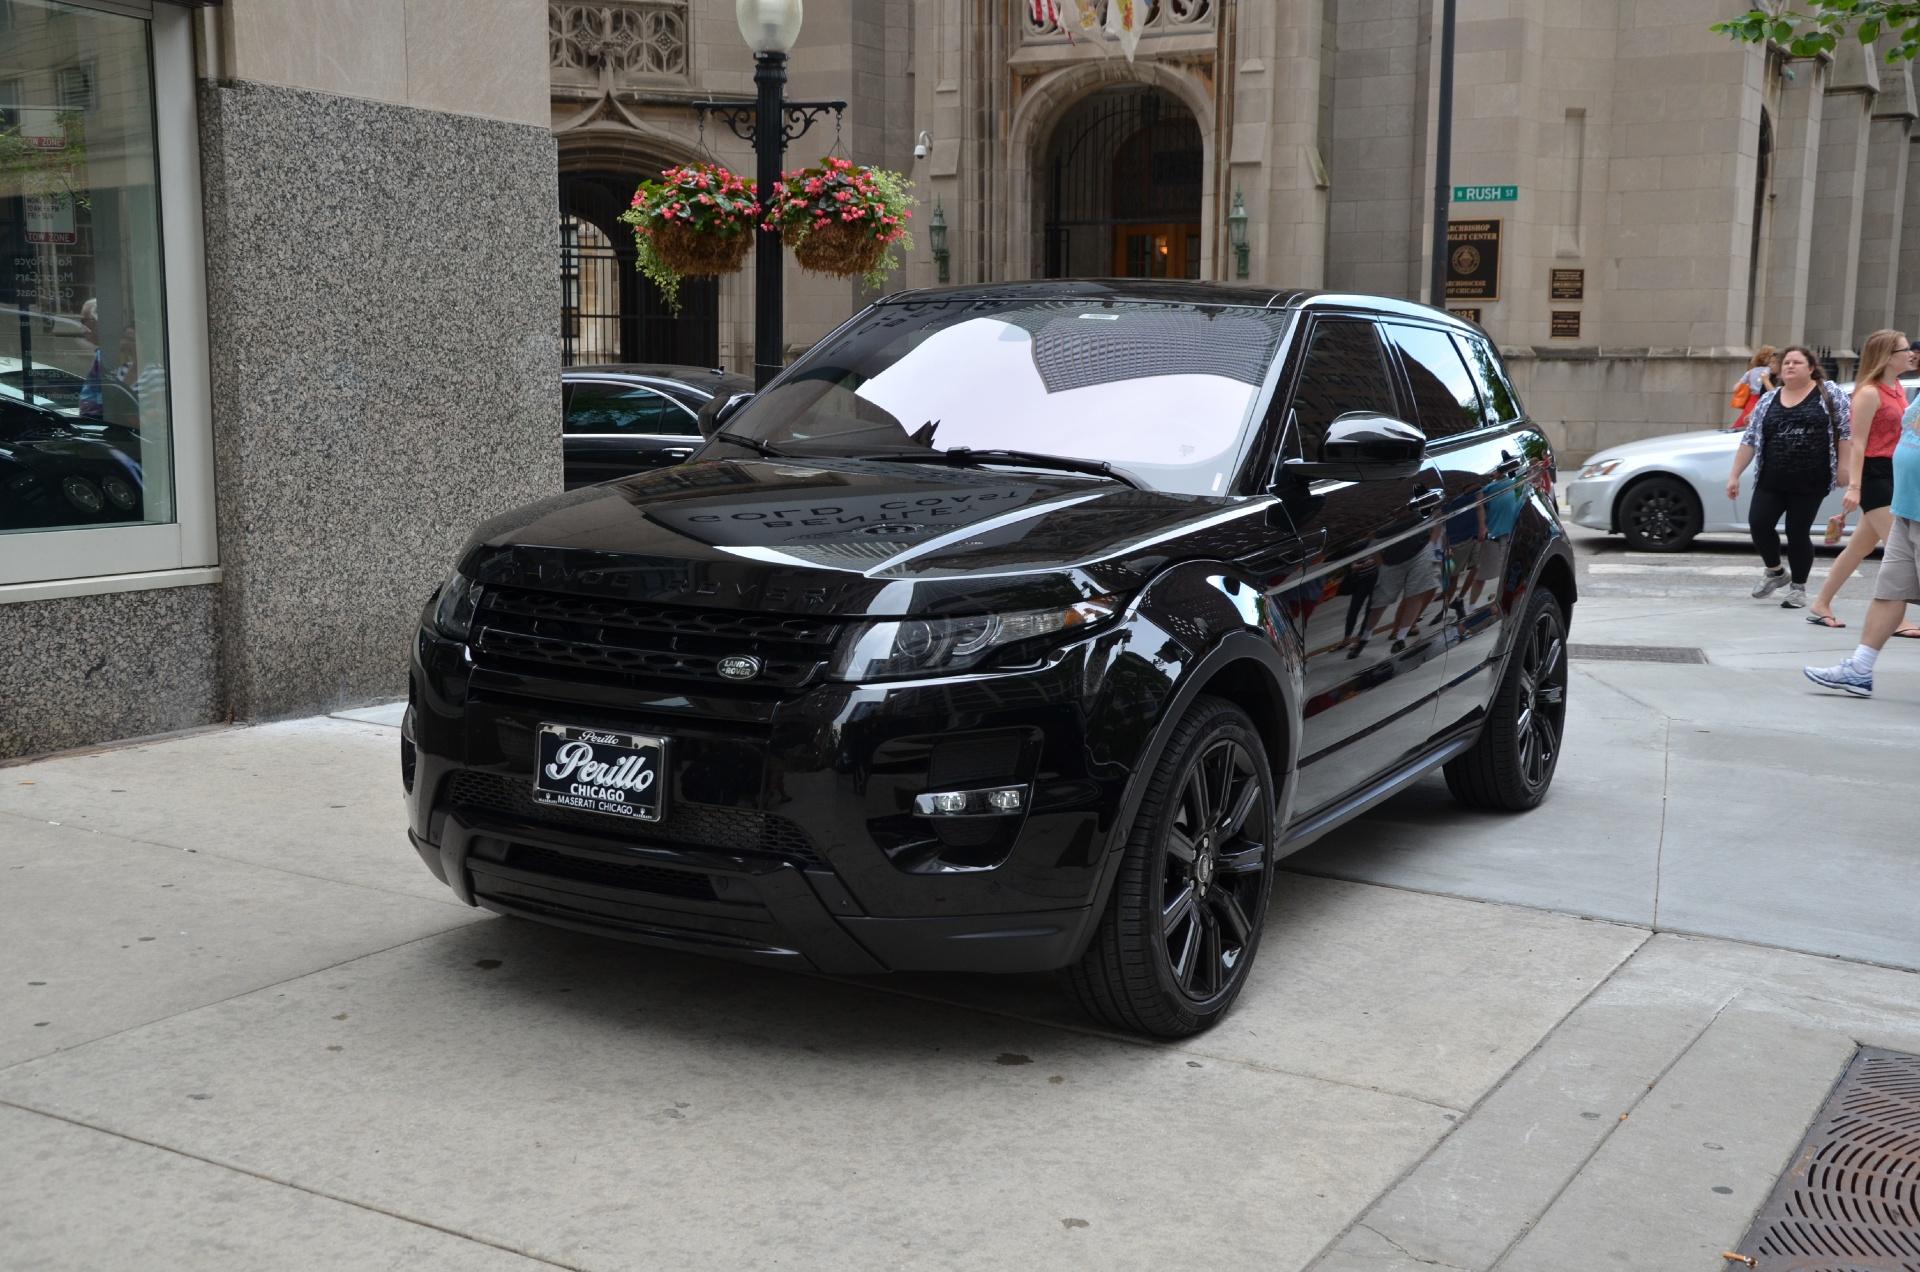 2014 Land Rover Range Rover Evoque Dynamic Stock GC1746 S for